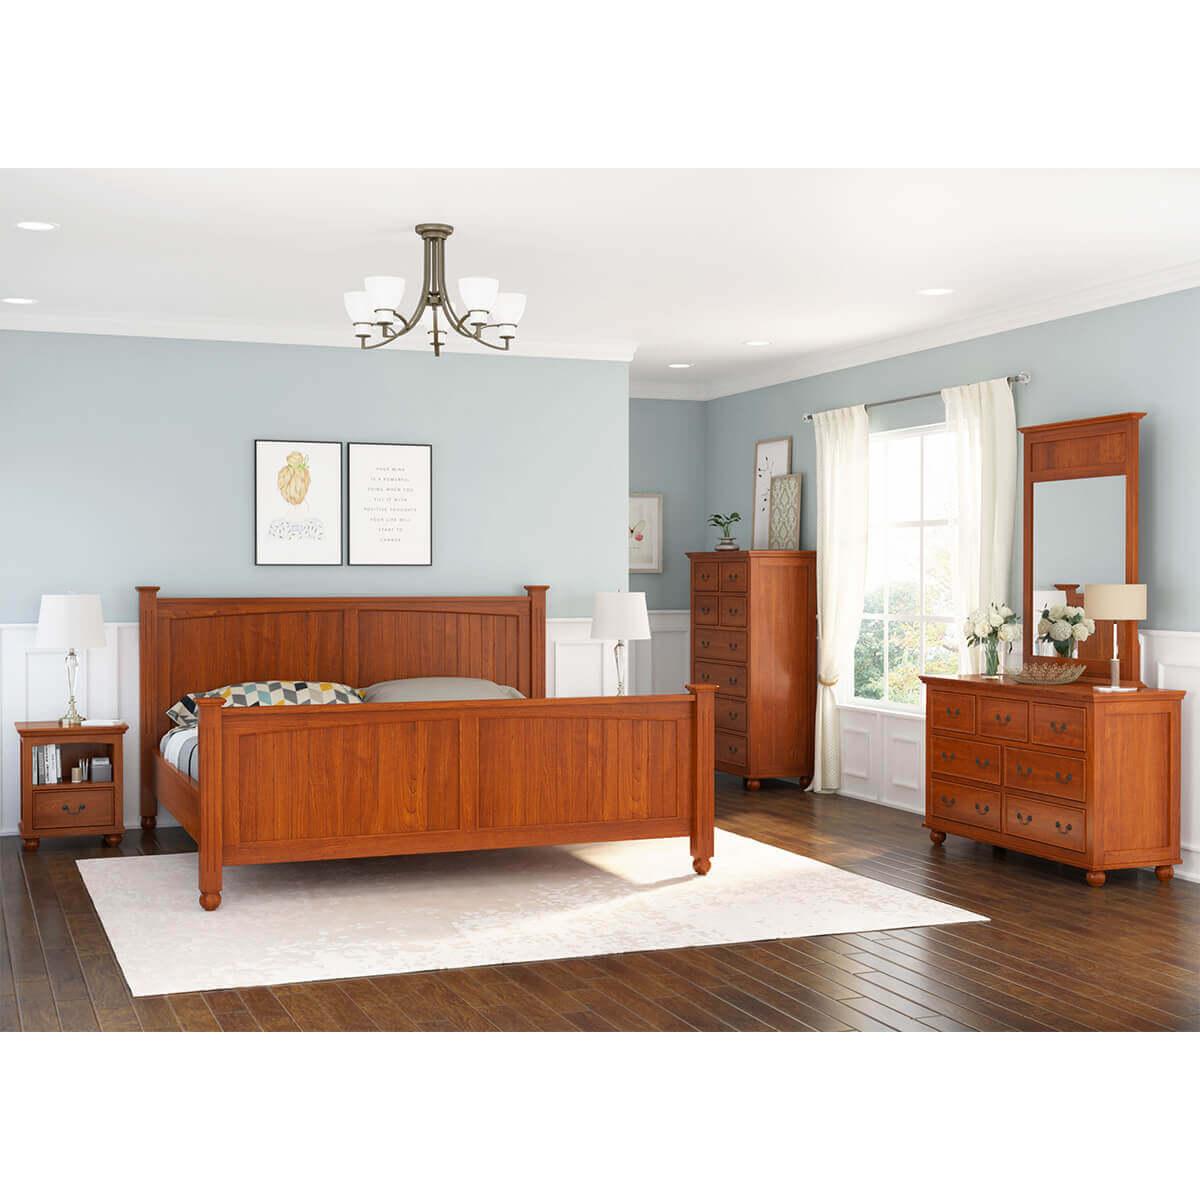 Delanson Solid Mahogany Wood 6 Piece California King Size Bedroom Set